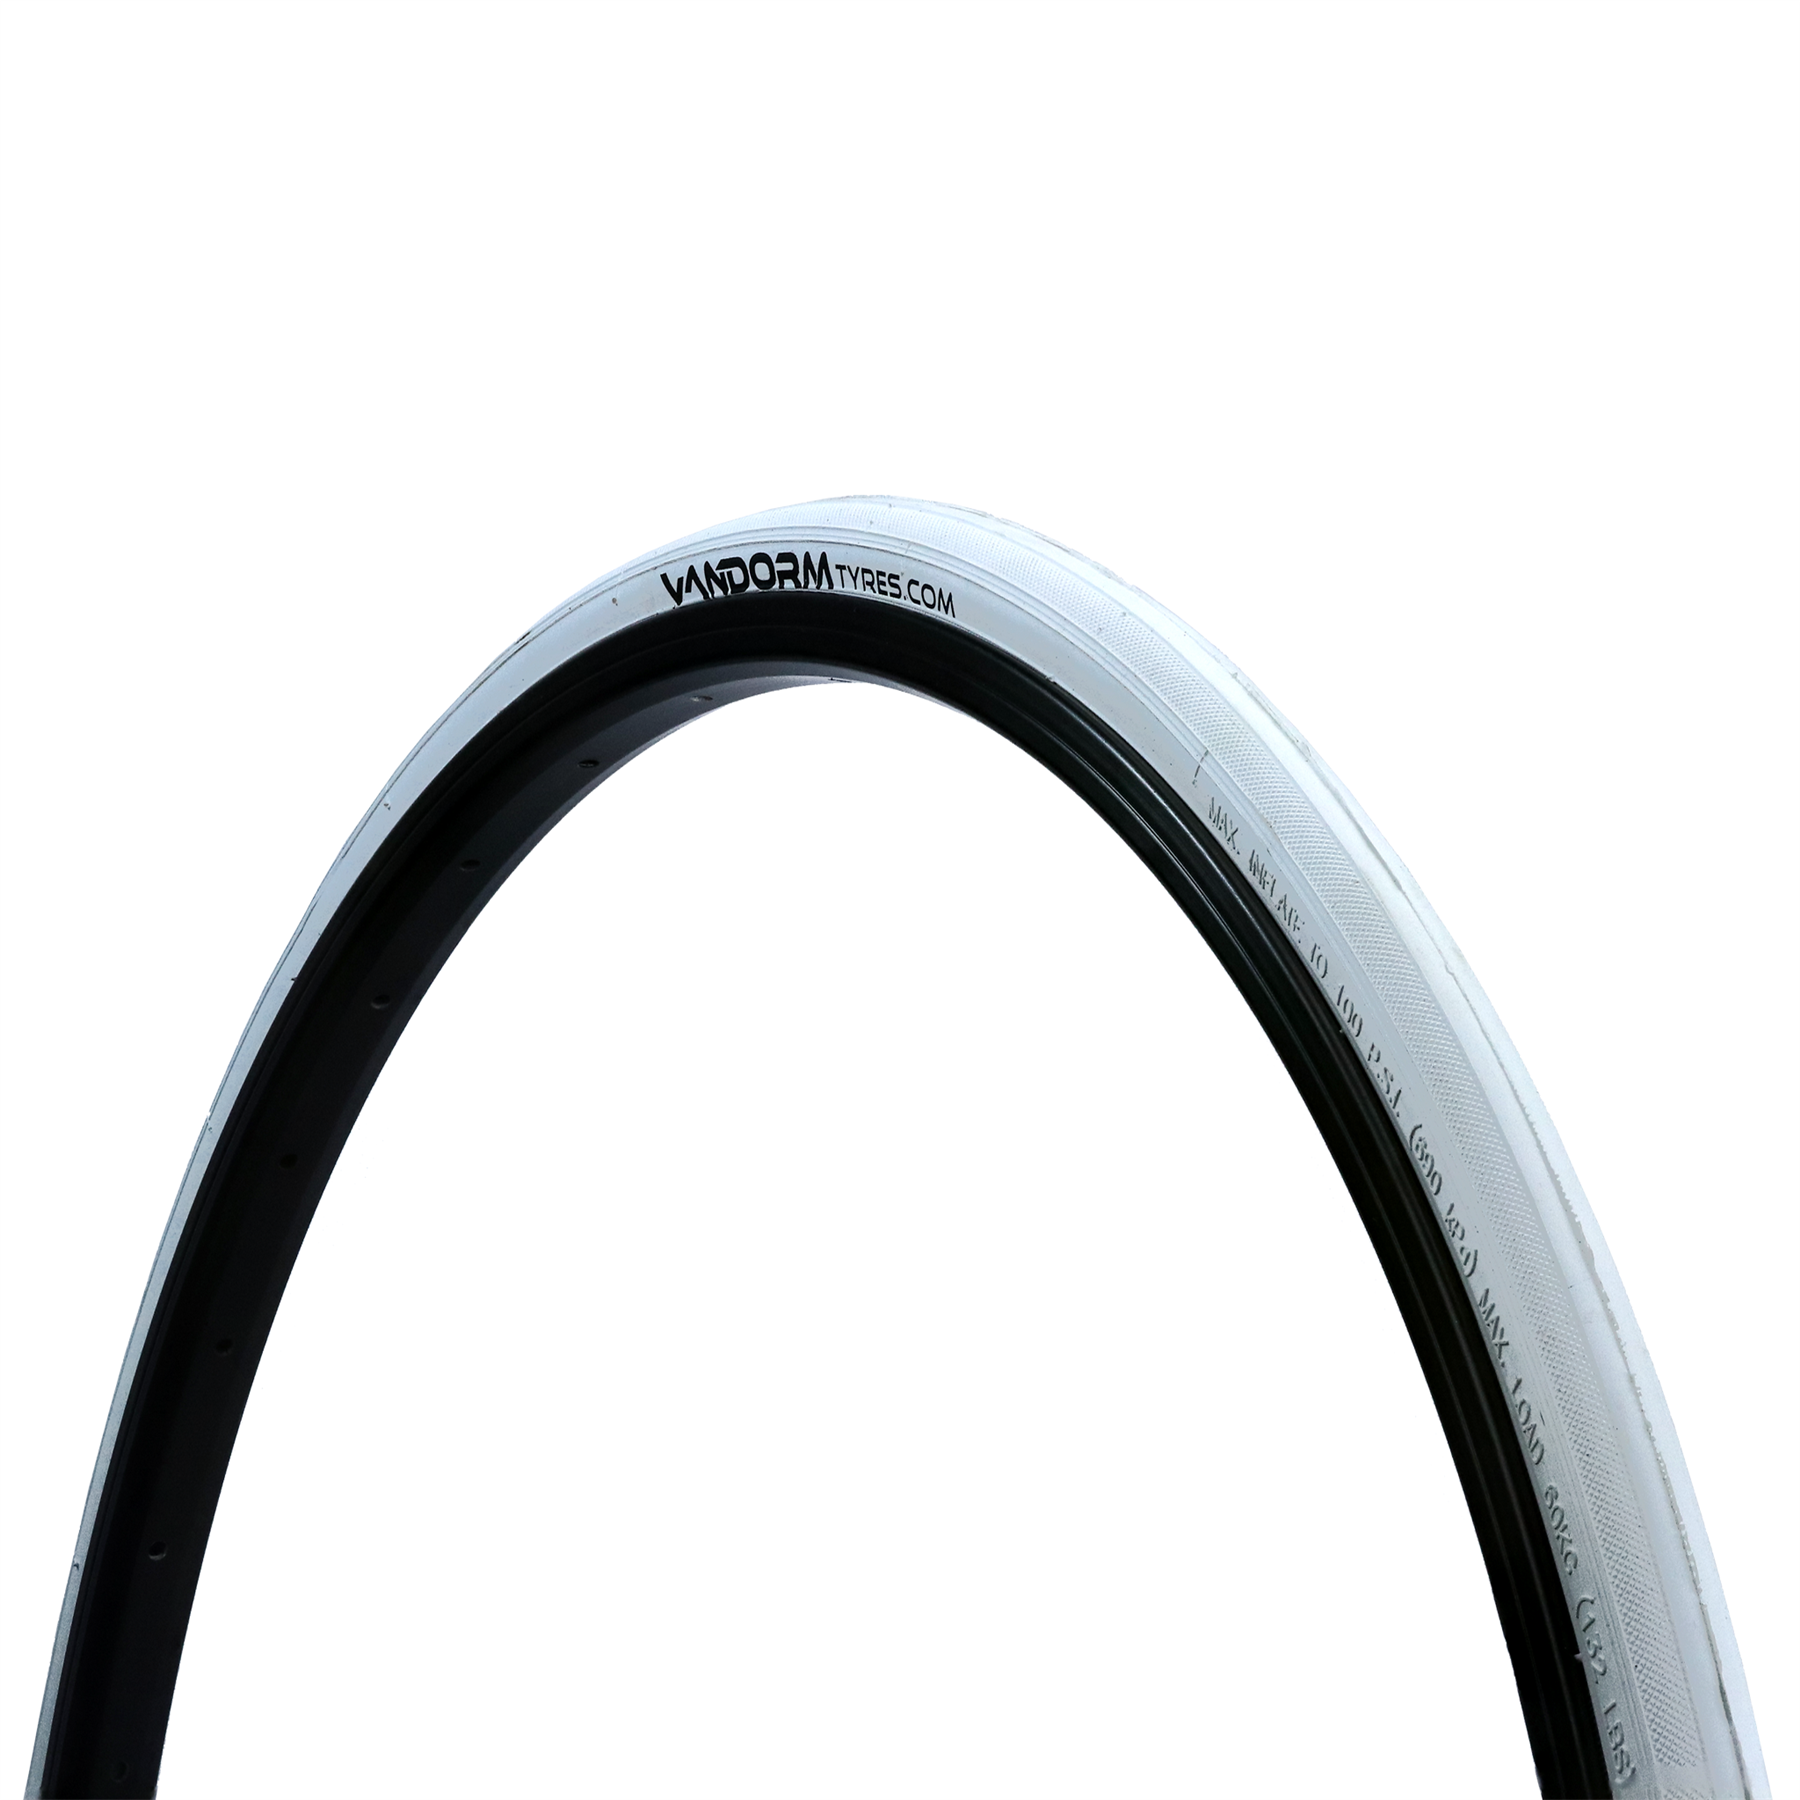 miniatuur 12 - Vandorm 700 x 23c SPEED 3 Colour Road Bike Fixie Tyres & Tube DEAL OPTIONS